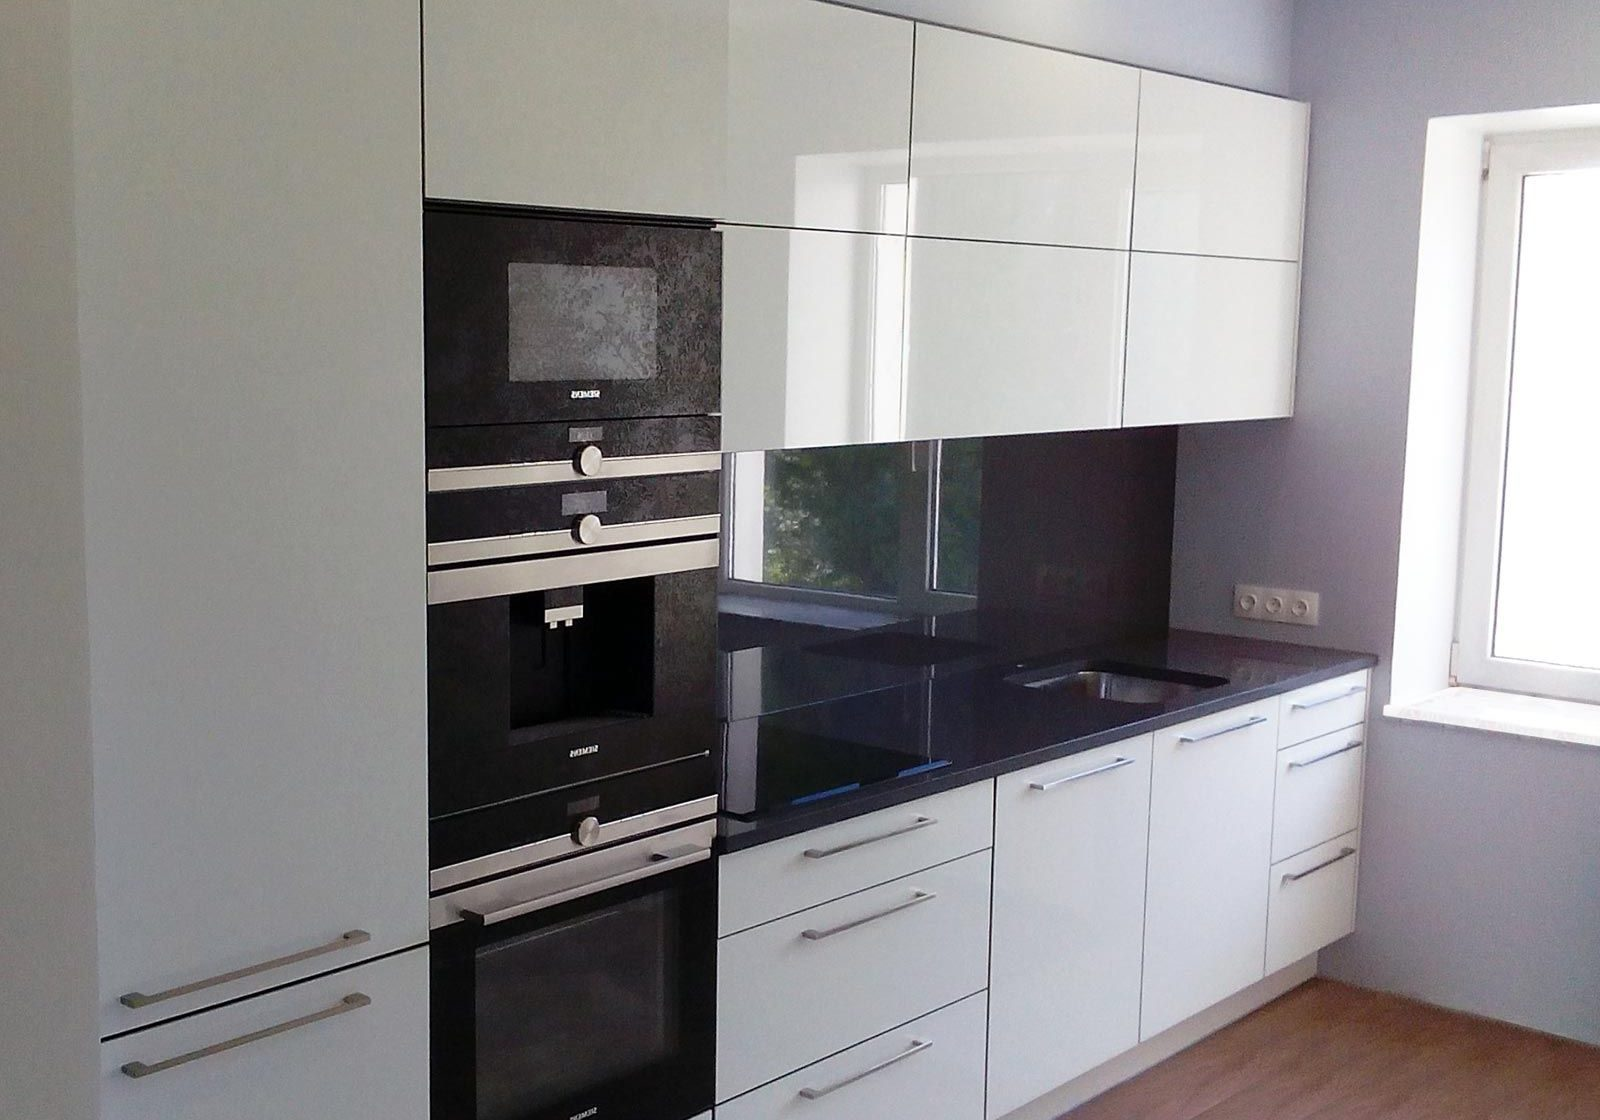 Небольшая глянцевая кухня, белого цвета